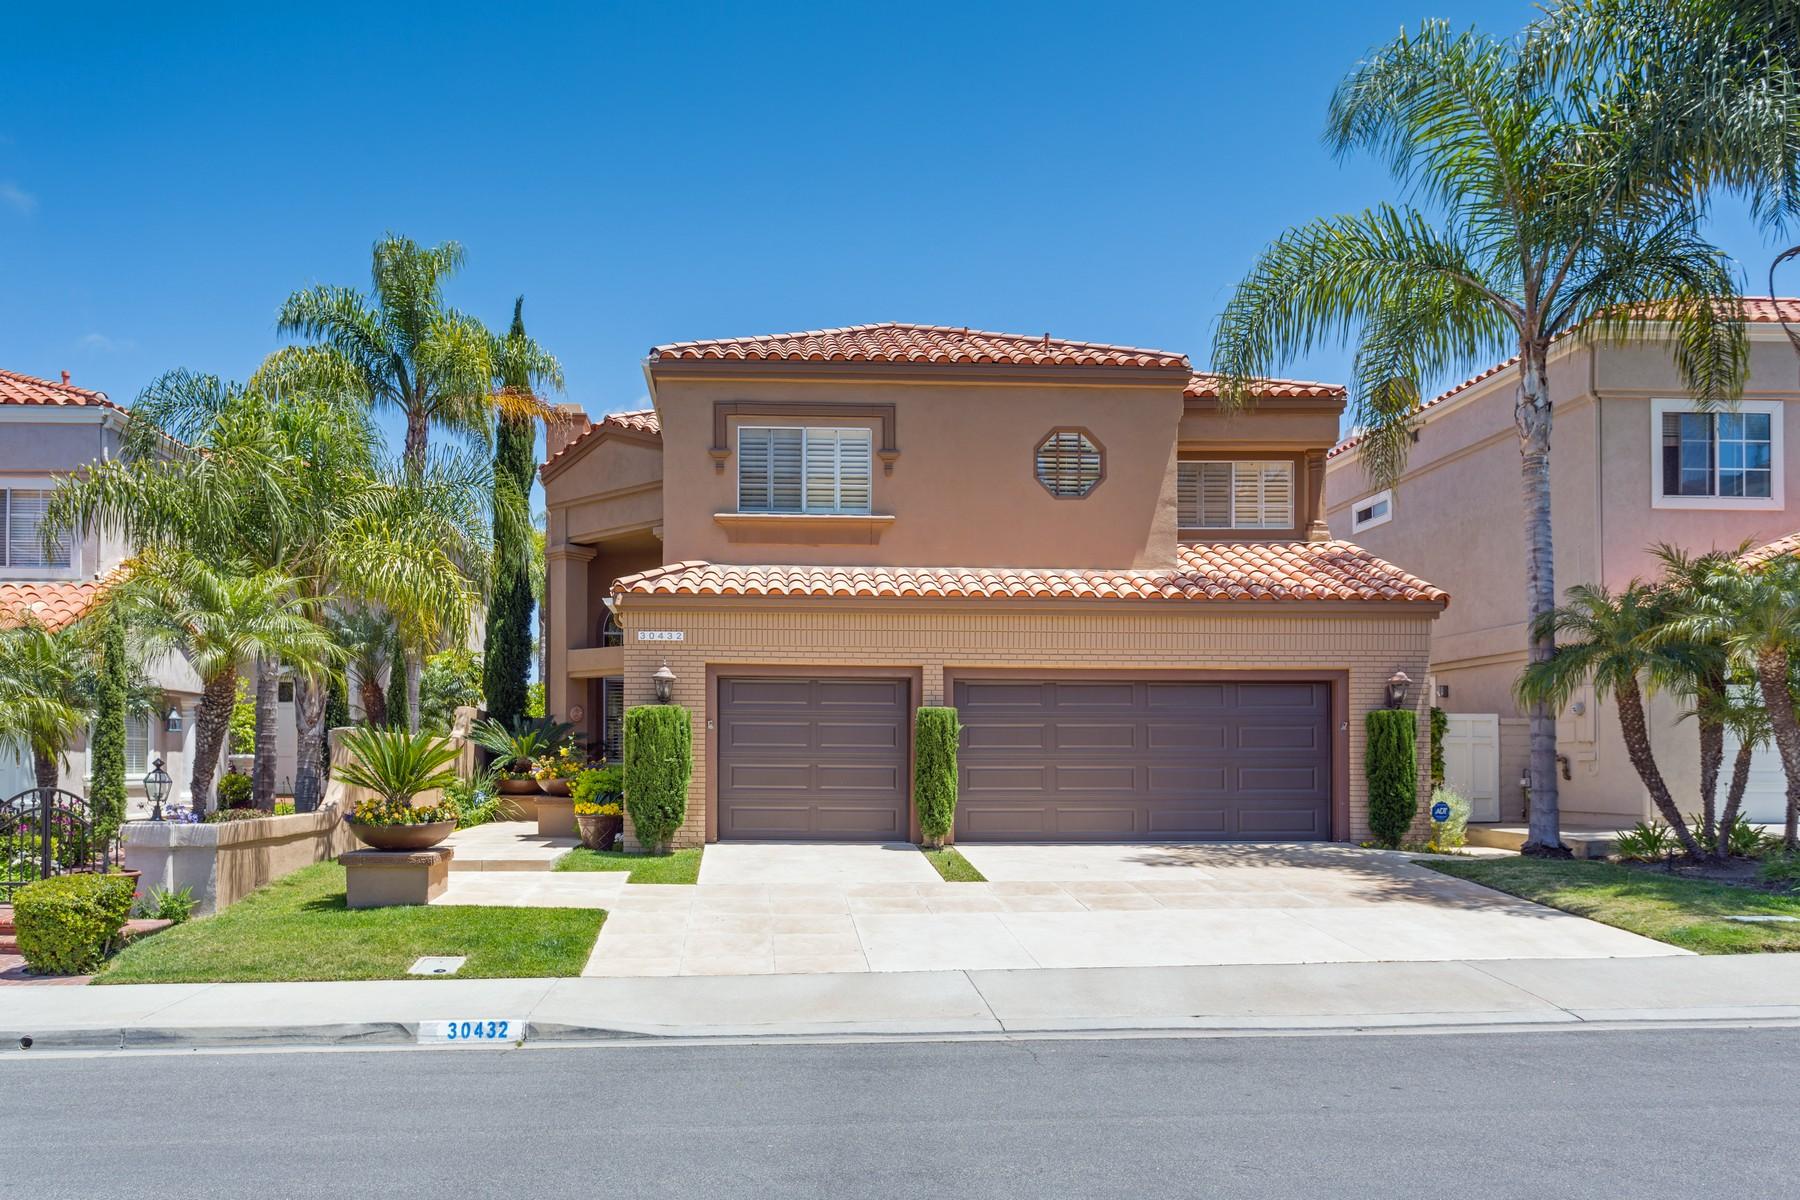 Single Family Home for Sale at 30432 La Vue Laguna Niguel, California 92677 United States